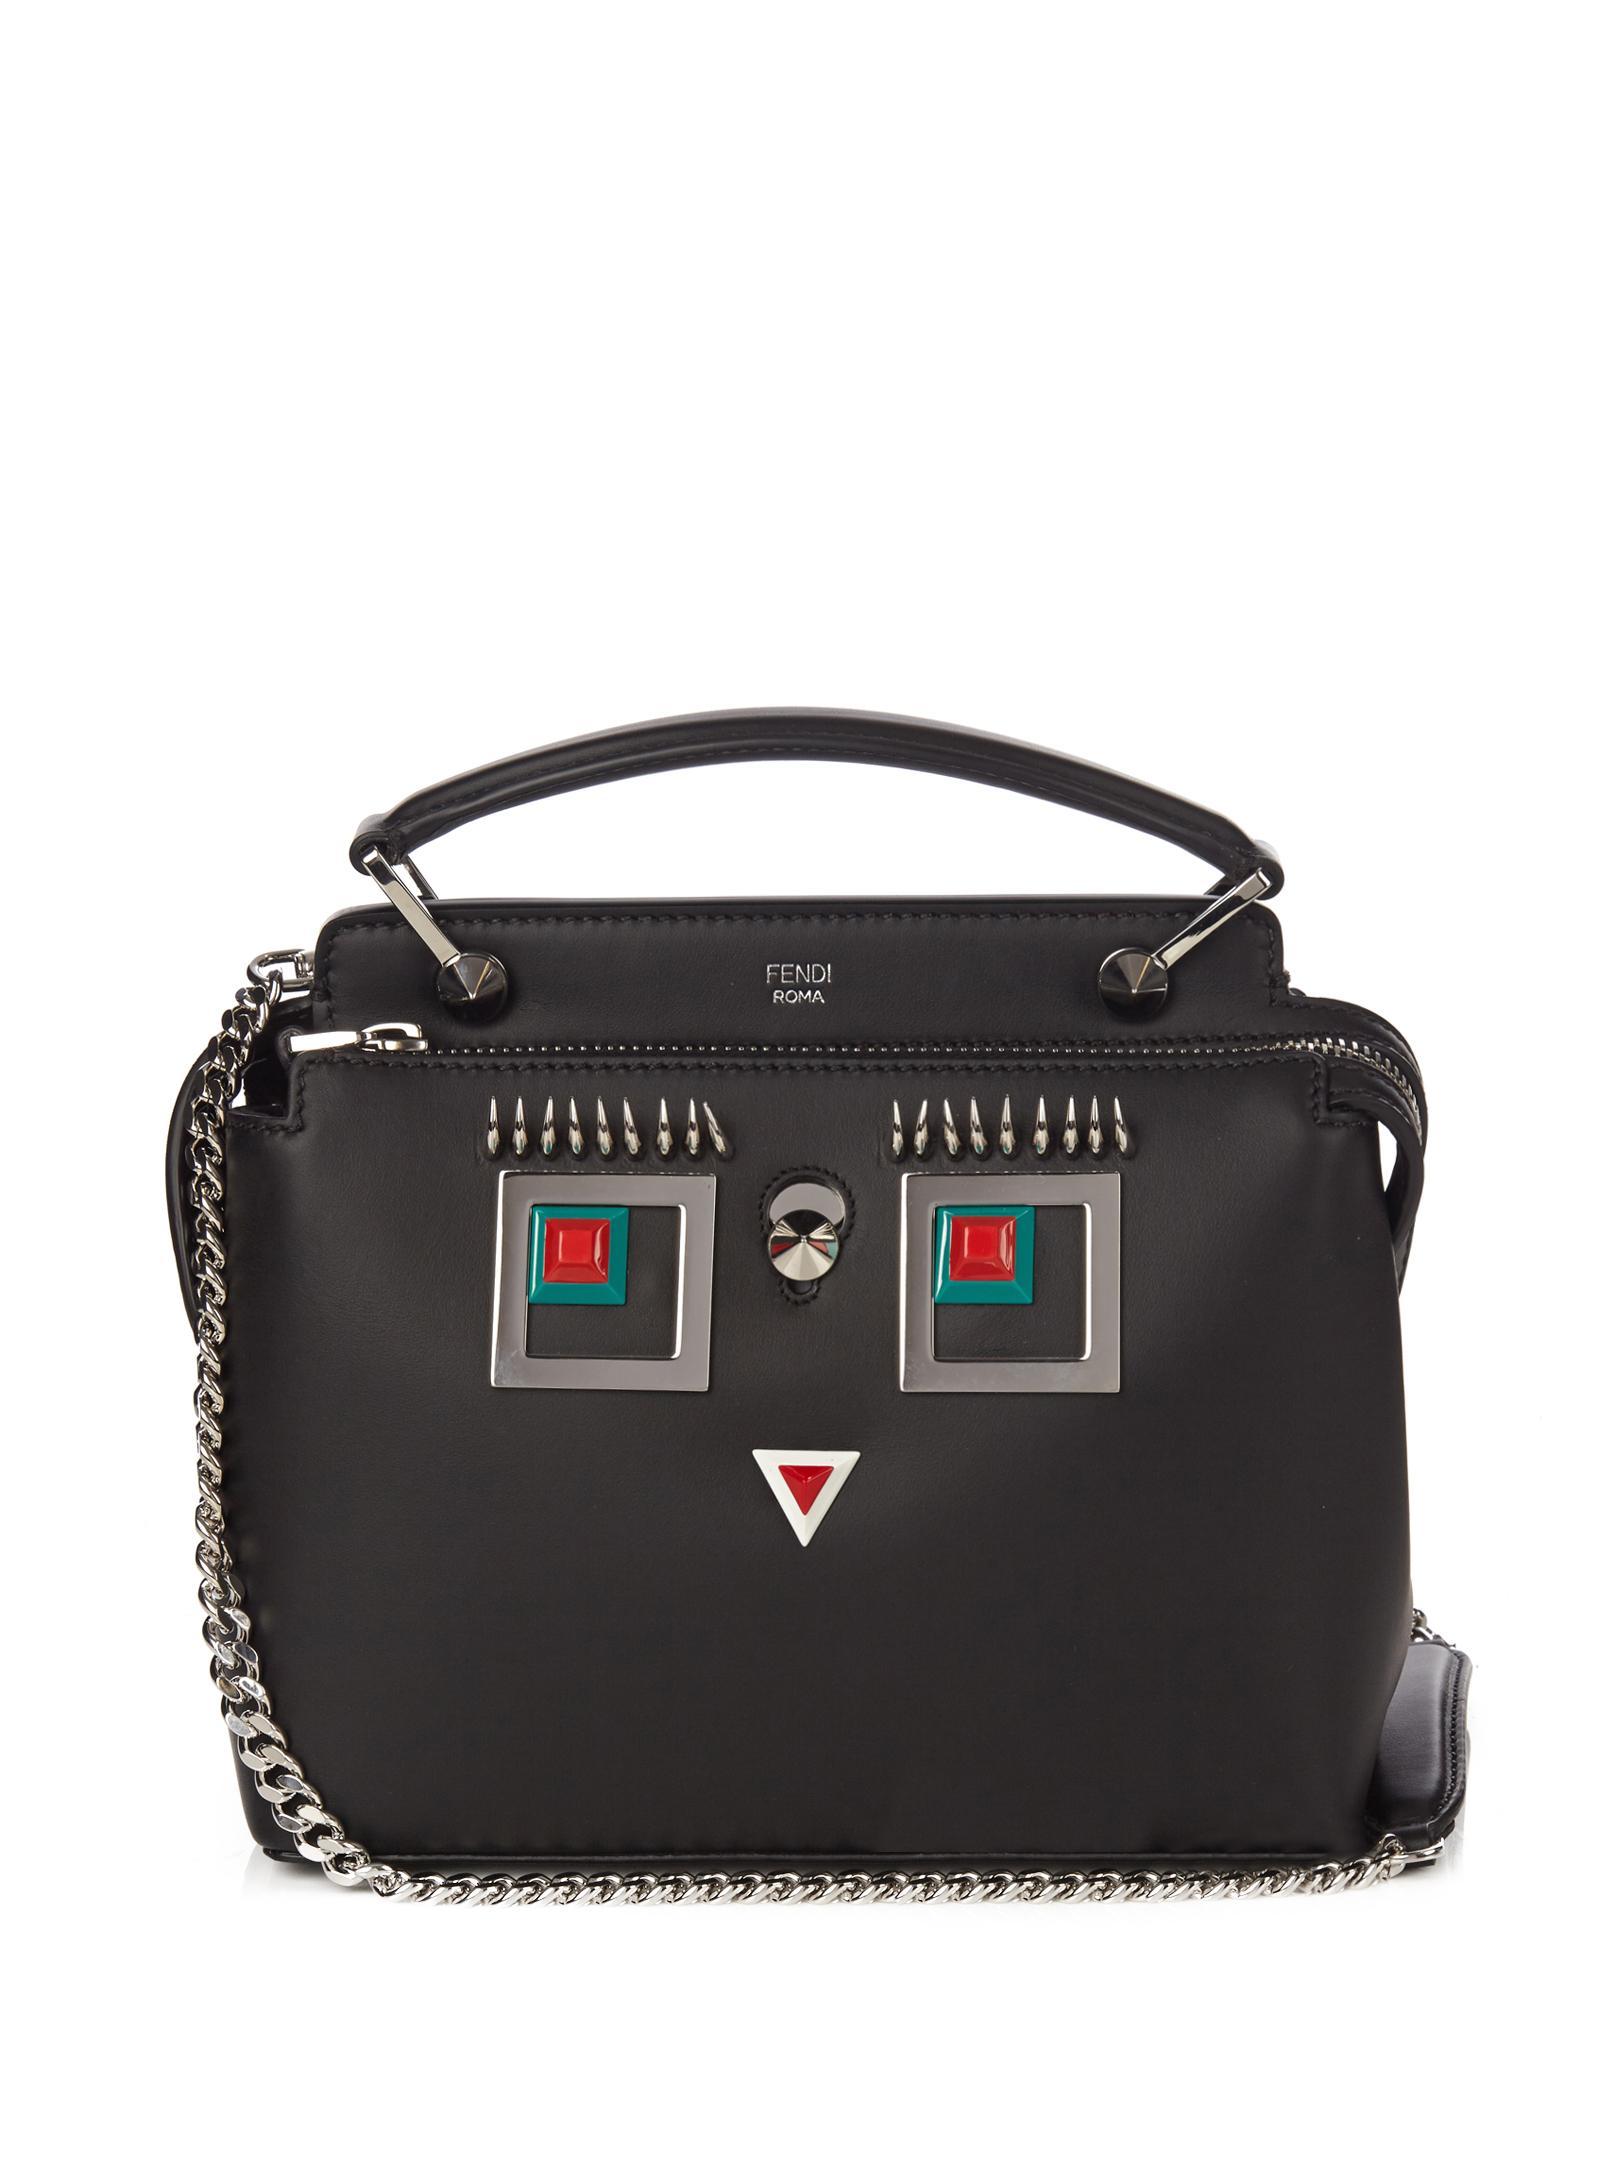 ccf448486fcb Fendi Dotcom Mini Square Eyes Shoulder Bag in Black - Lyst